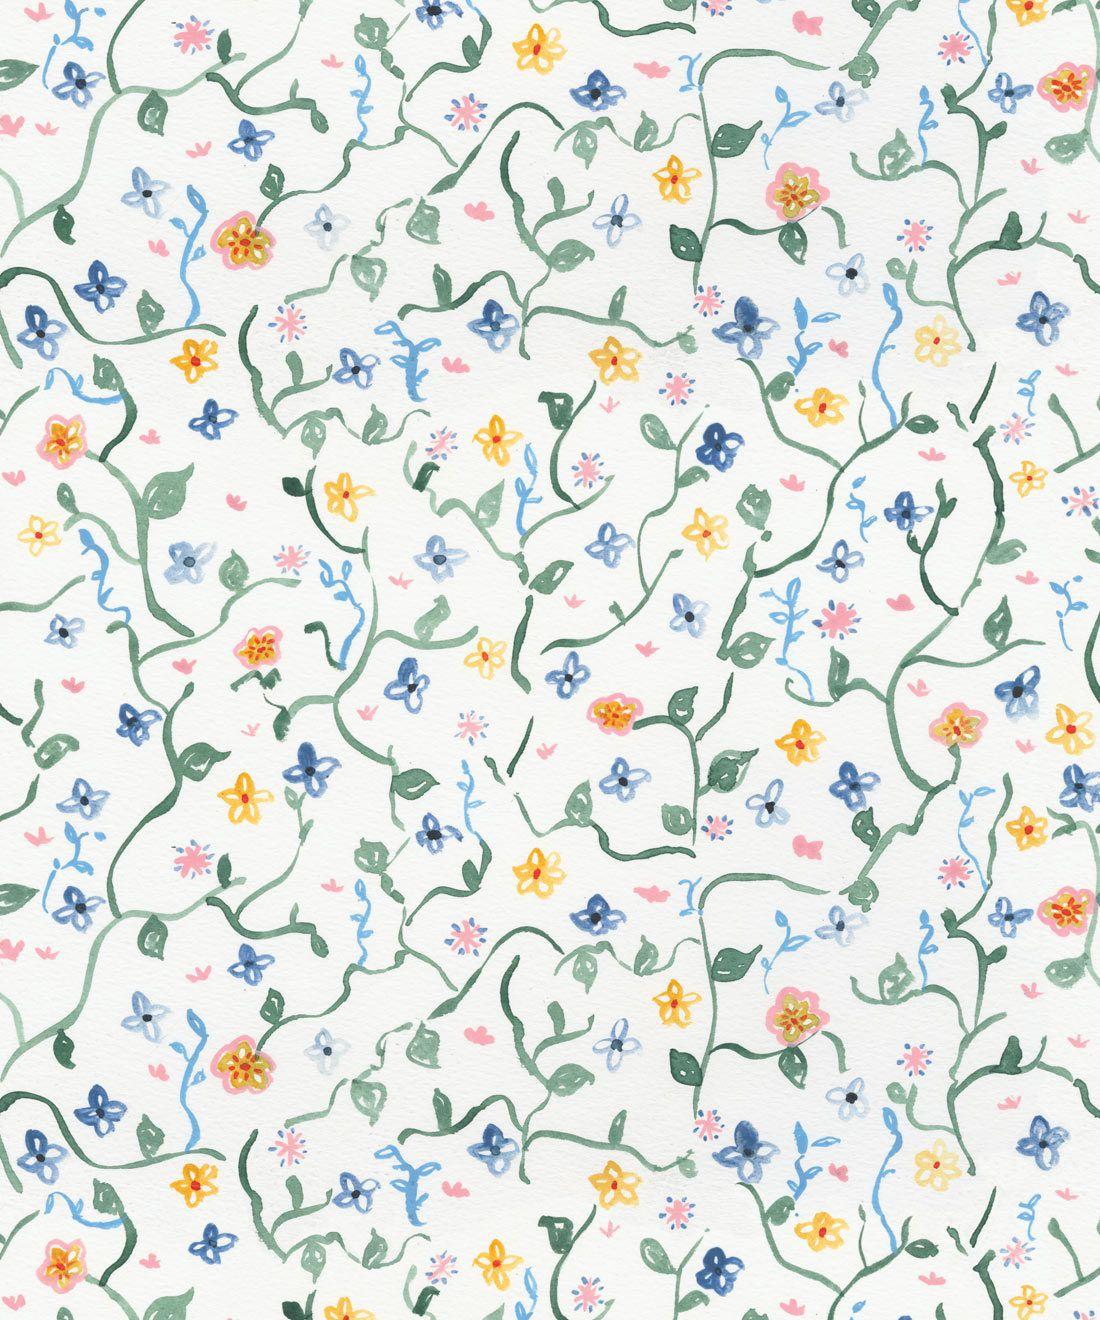 Wild Garden • Dainty Floral Wallpaper • Milton & King USA •Georgia MacMillan